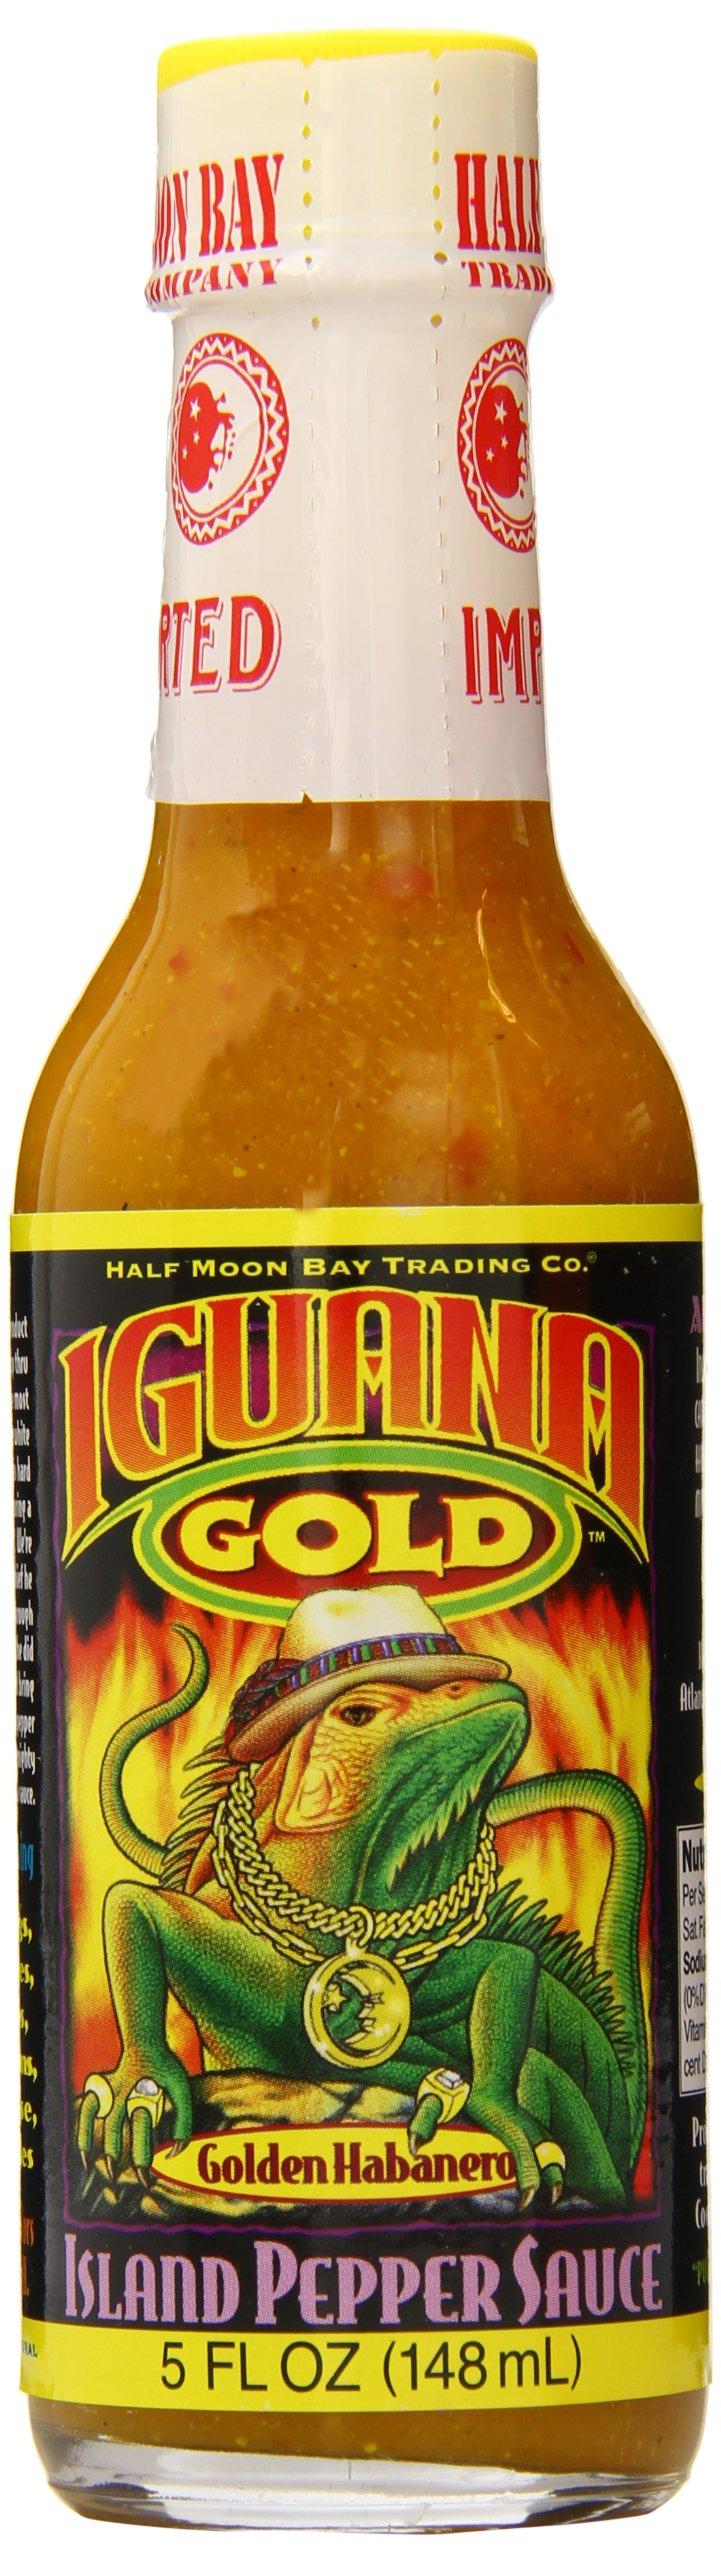 Iguana Gold Habanero Island Pepper Sauce, 5 Ounce